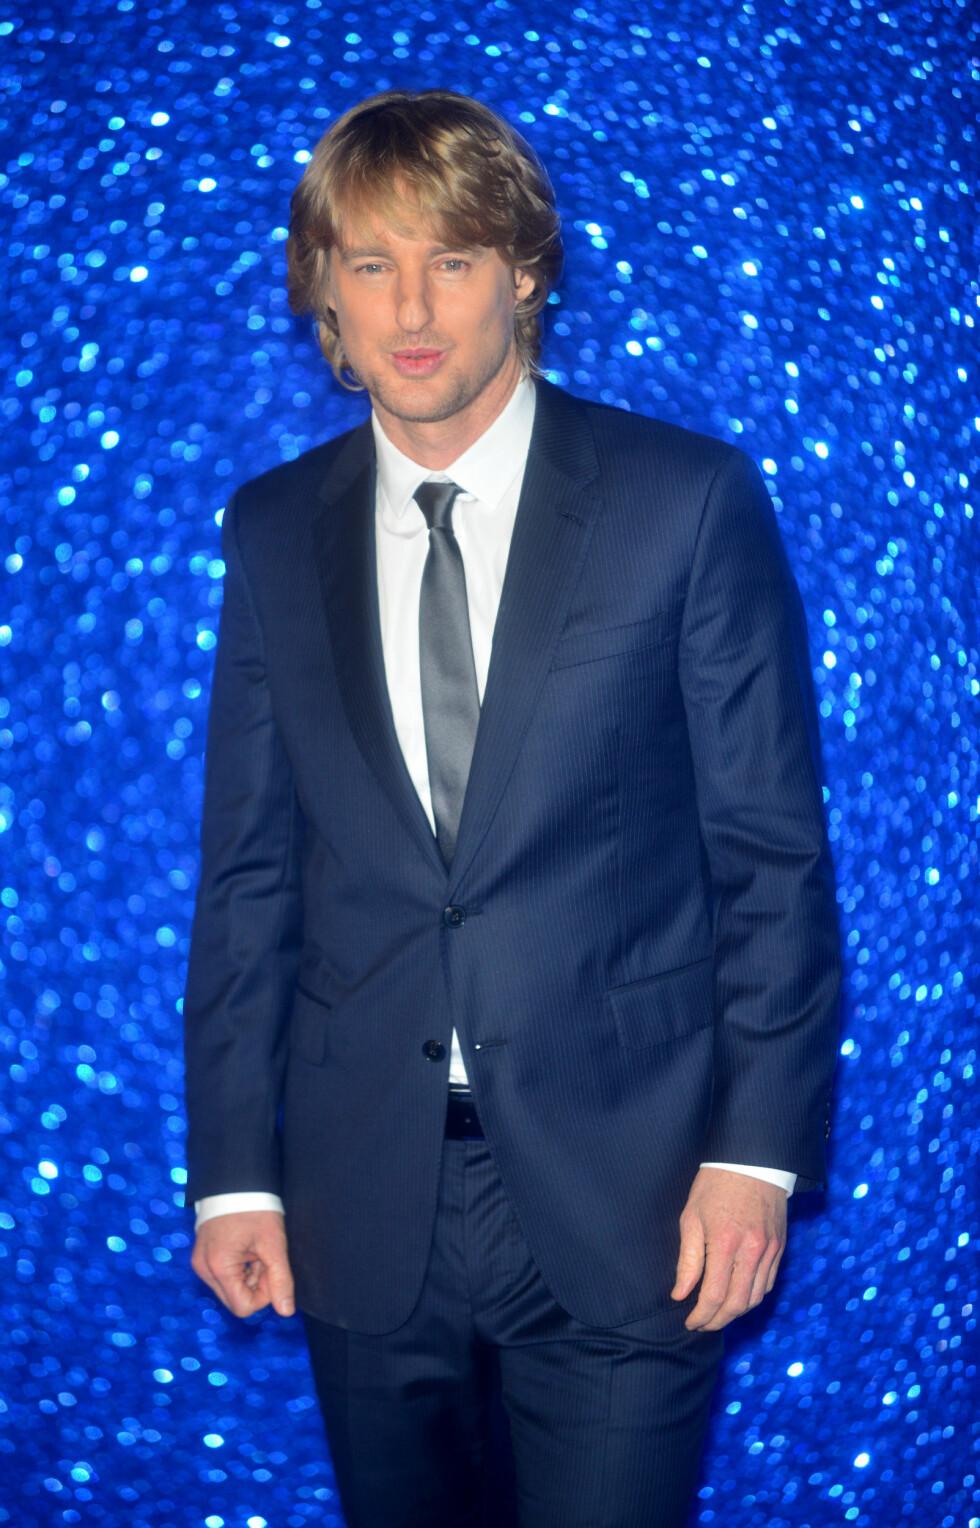 ALDRI VÆRT GIFT: Skuespiller Owen Wilson (47). Foto: NTB Scanpix